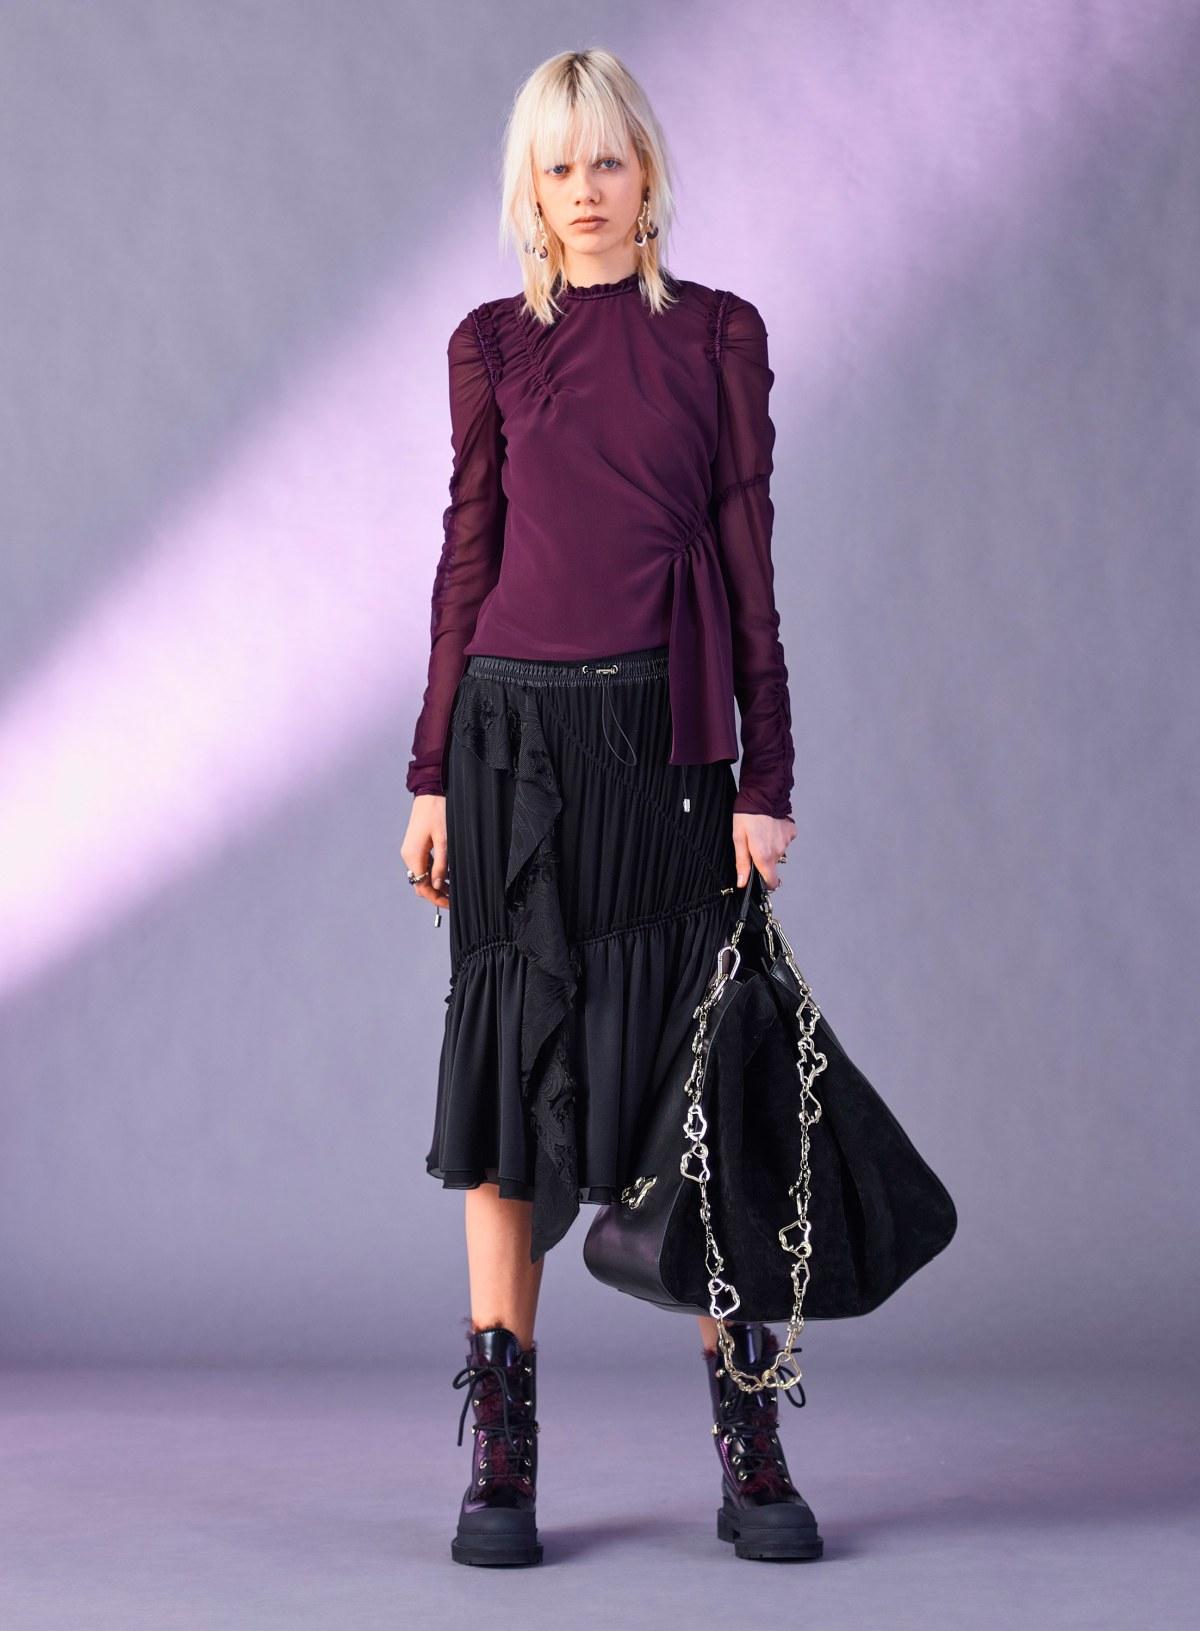 versace-pre-fall-2017-fashion-show-the-impression-21